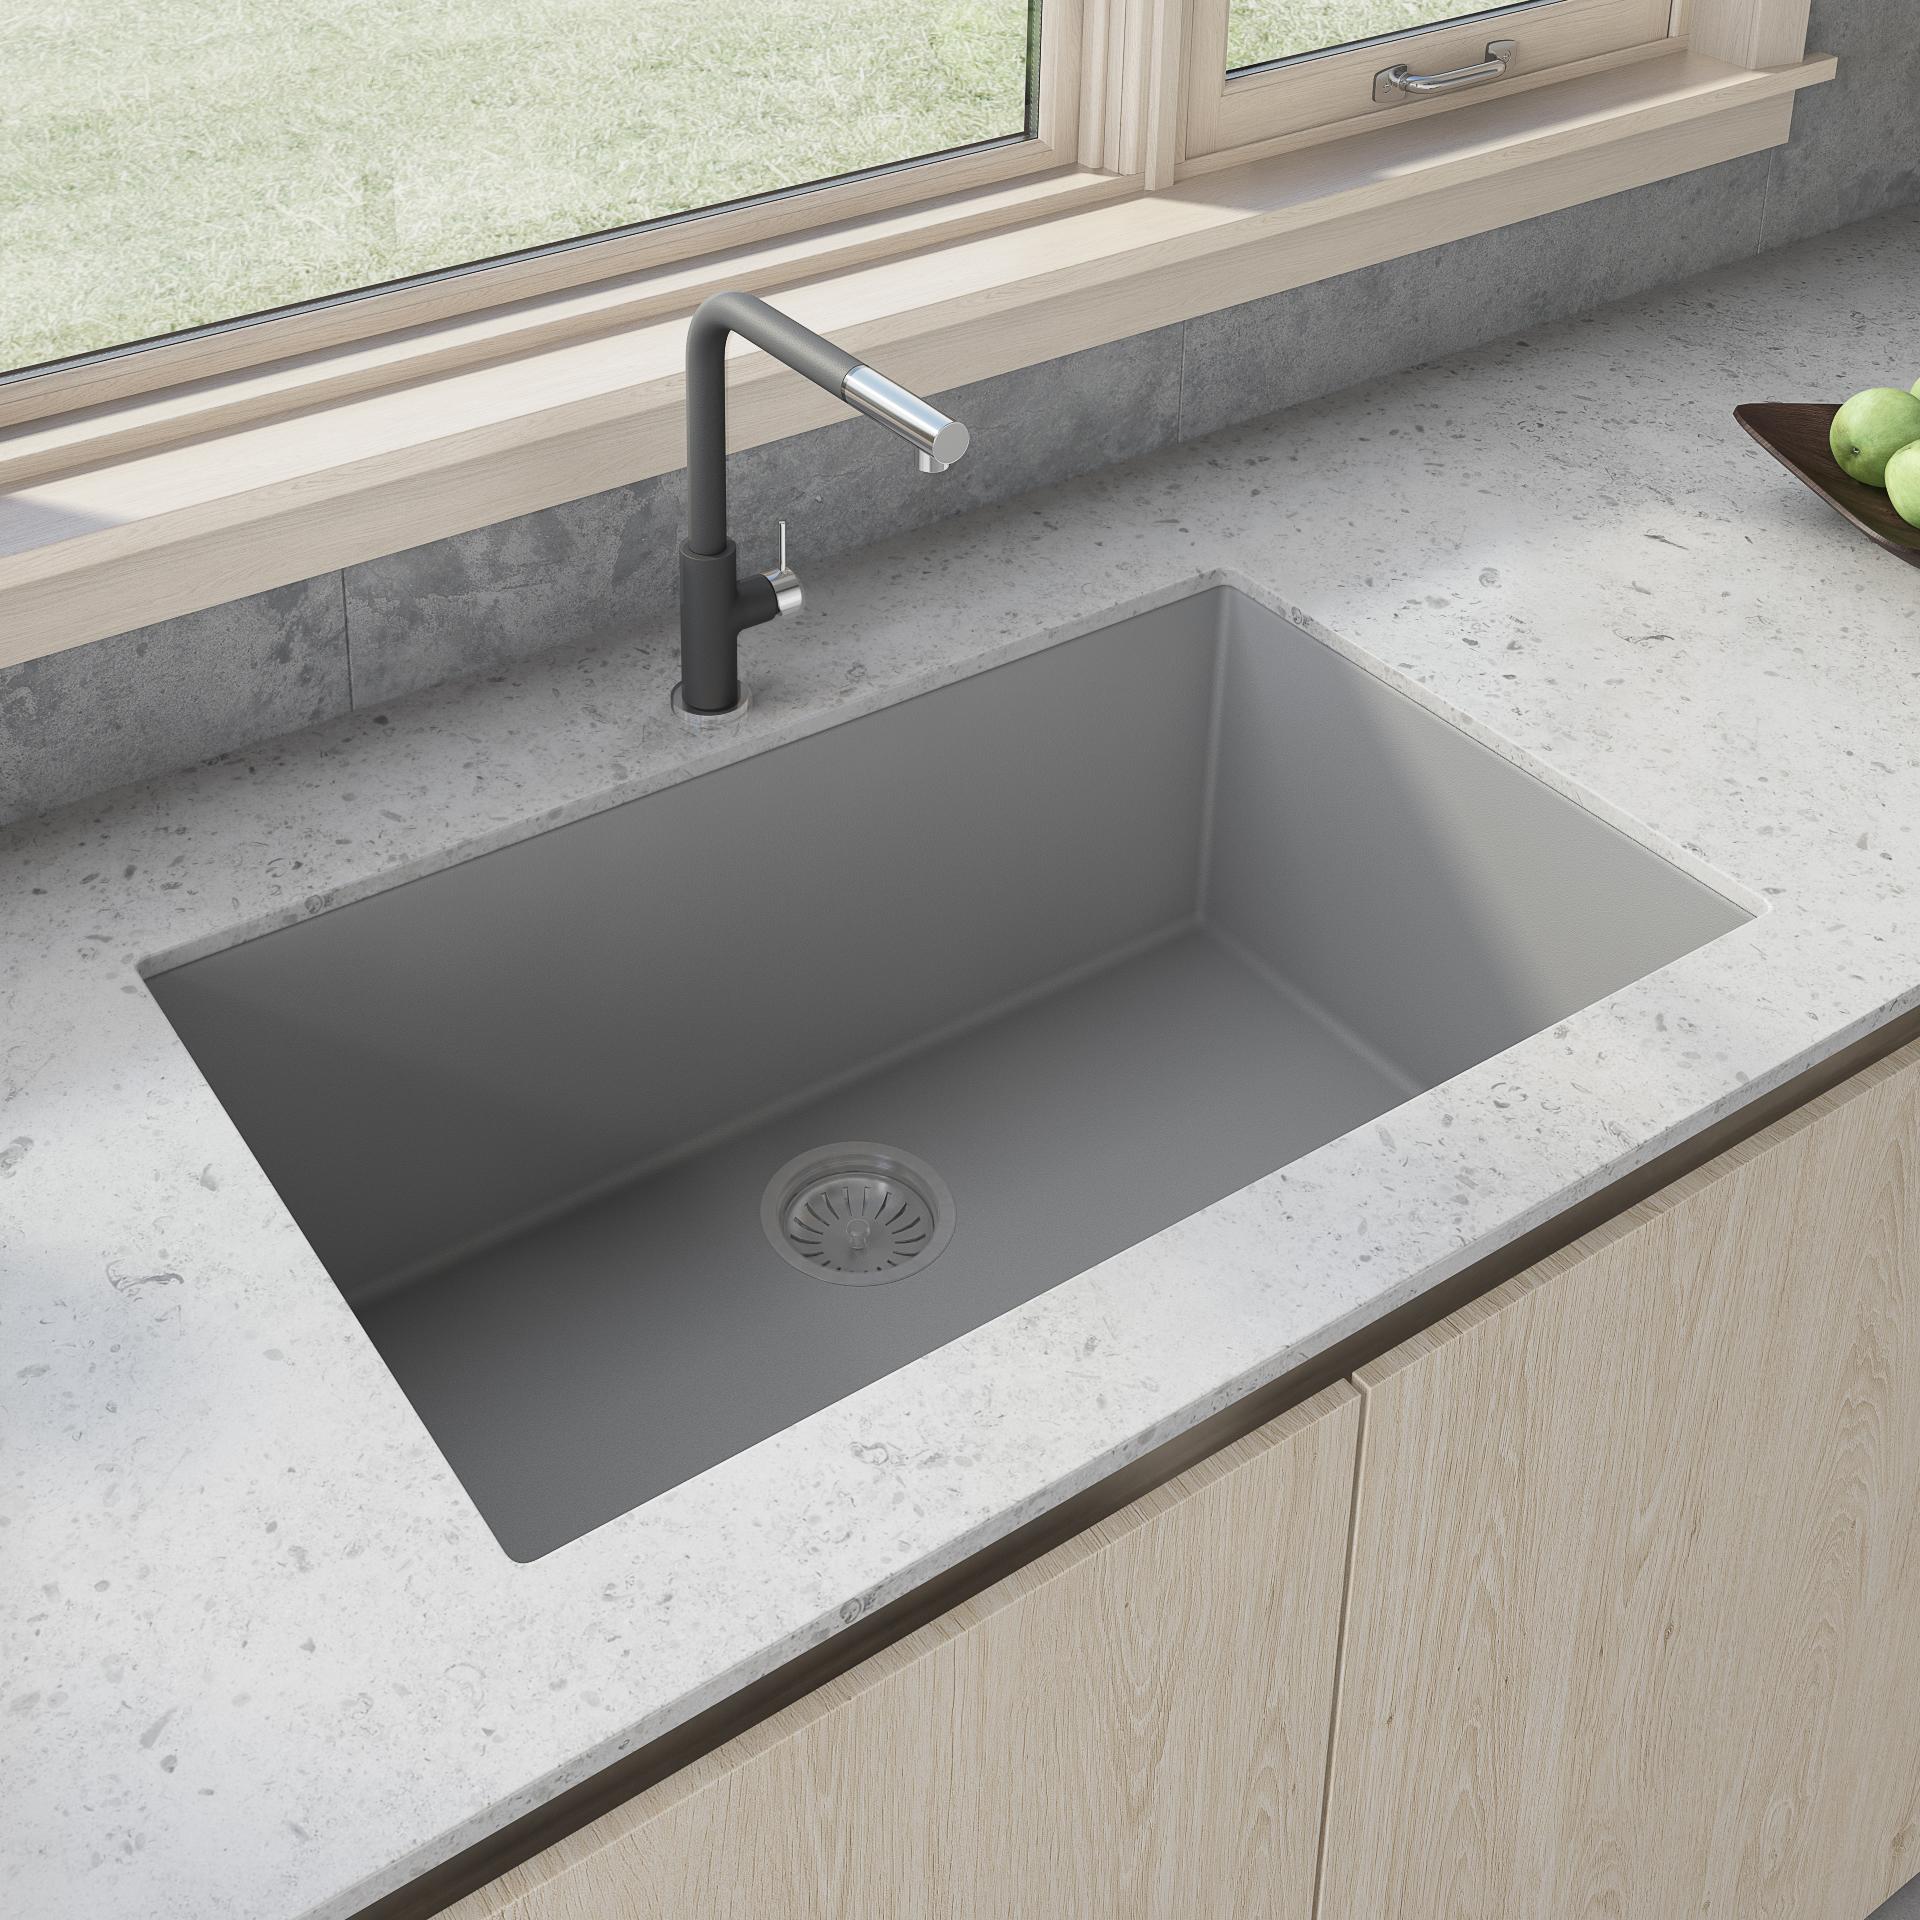 30 X 17 Inch Granite Composite Undermount Single Bowl Kitchen Sink Silver Gray Ruvati Usa